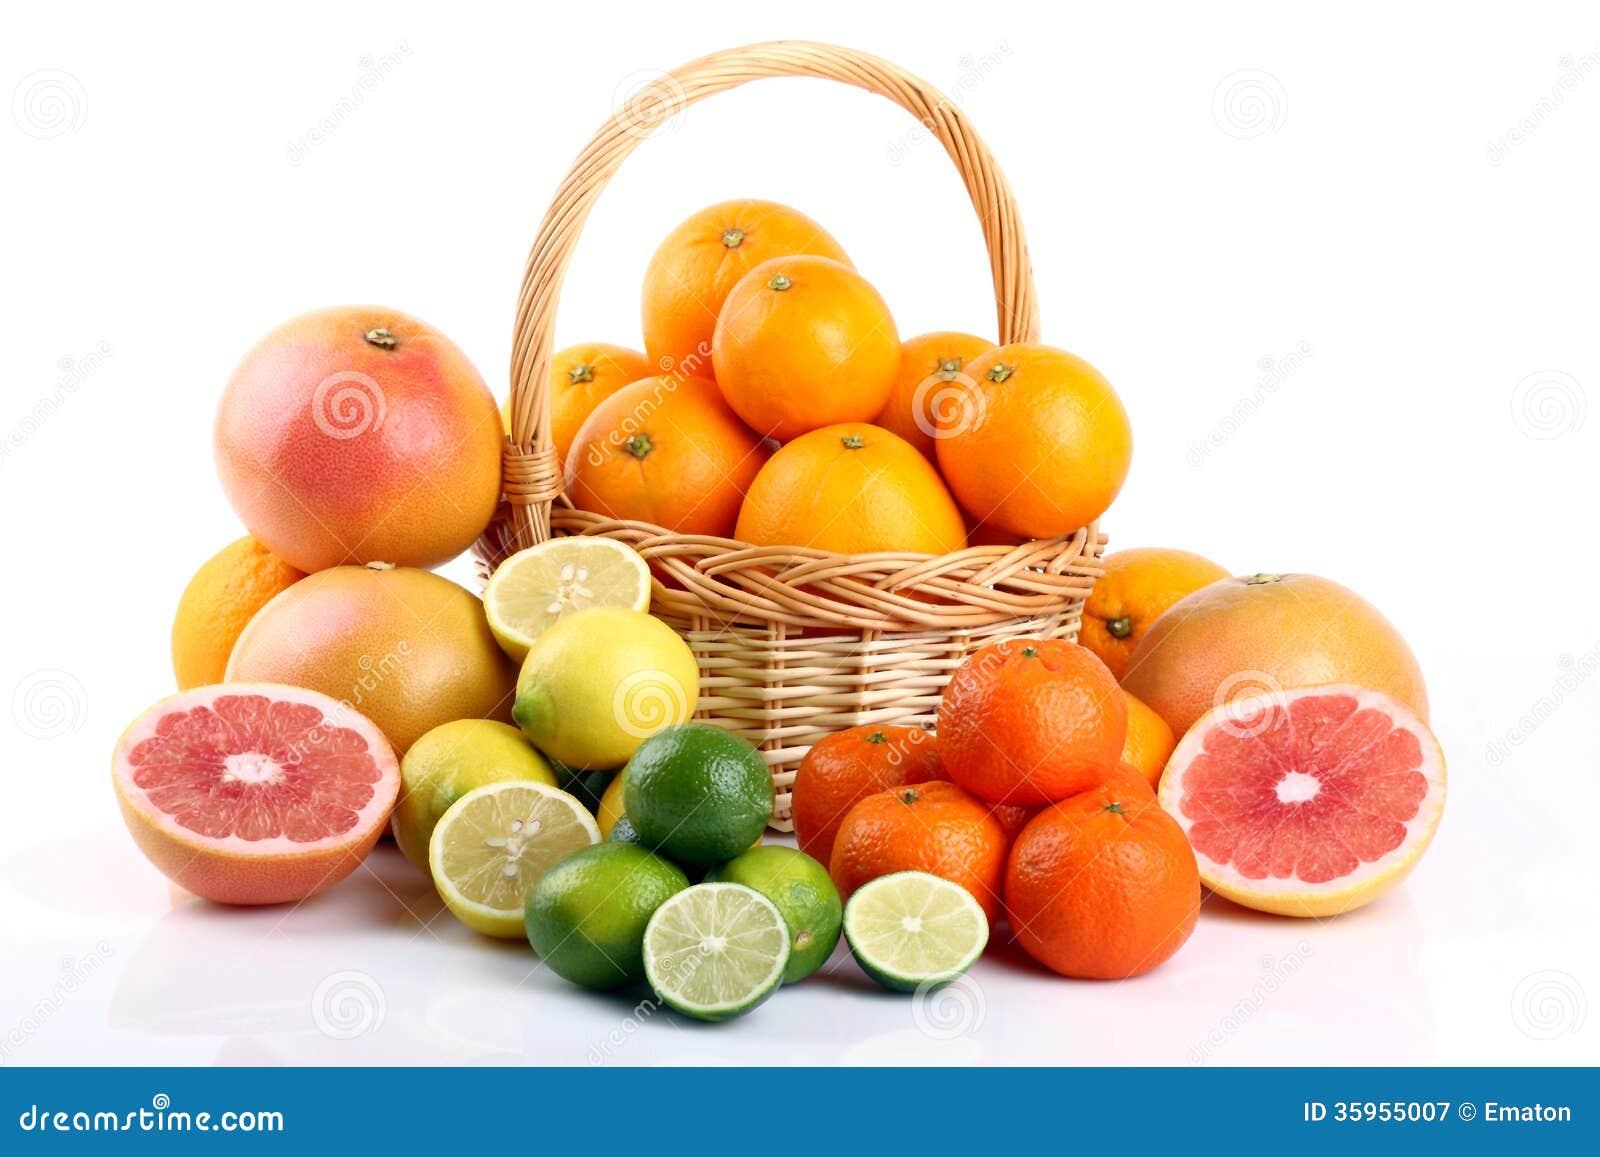 Agrios mezclados en cesta de mimbre